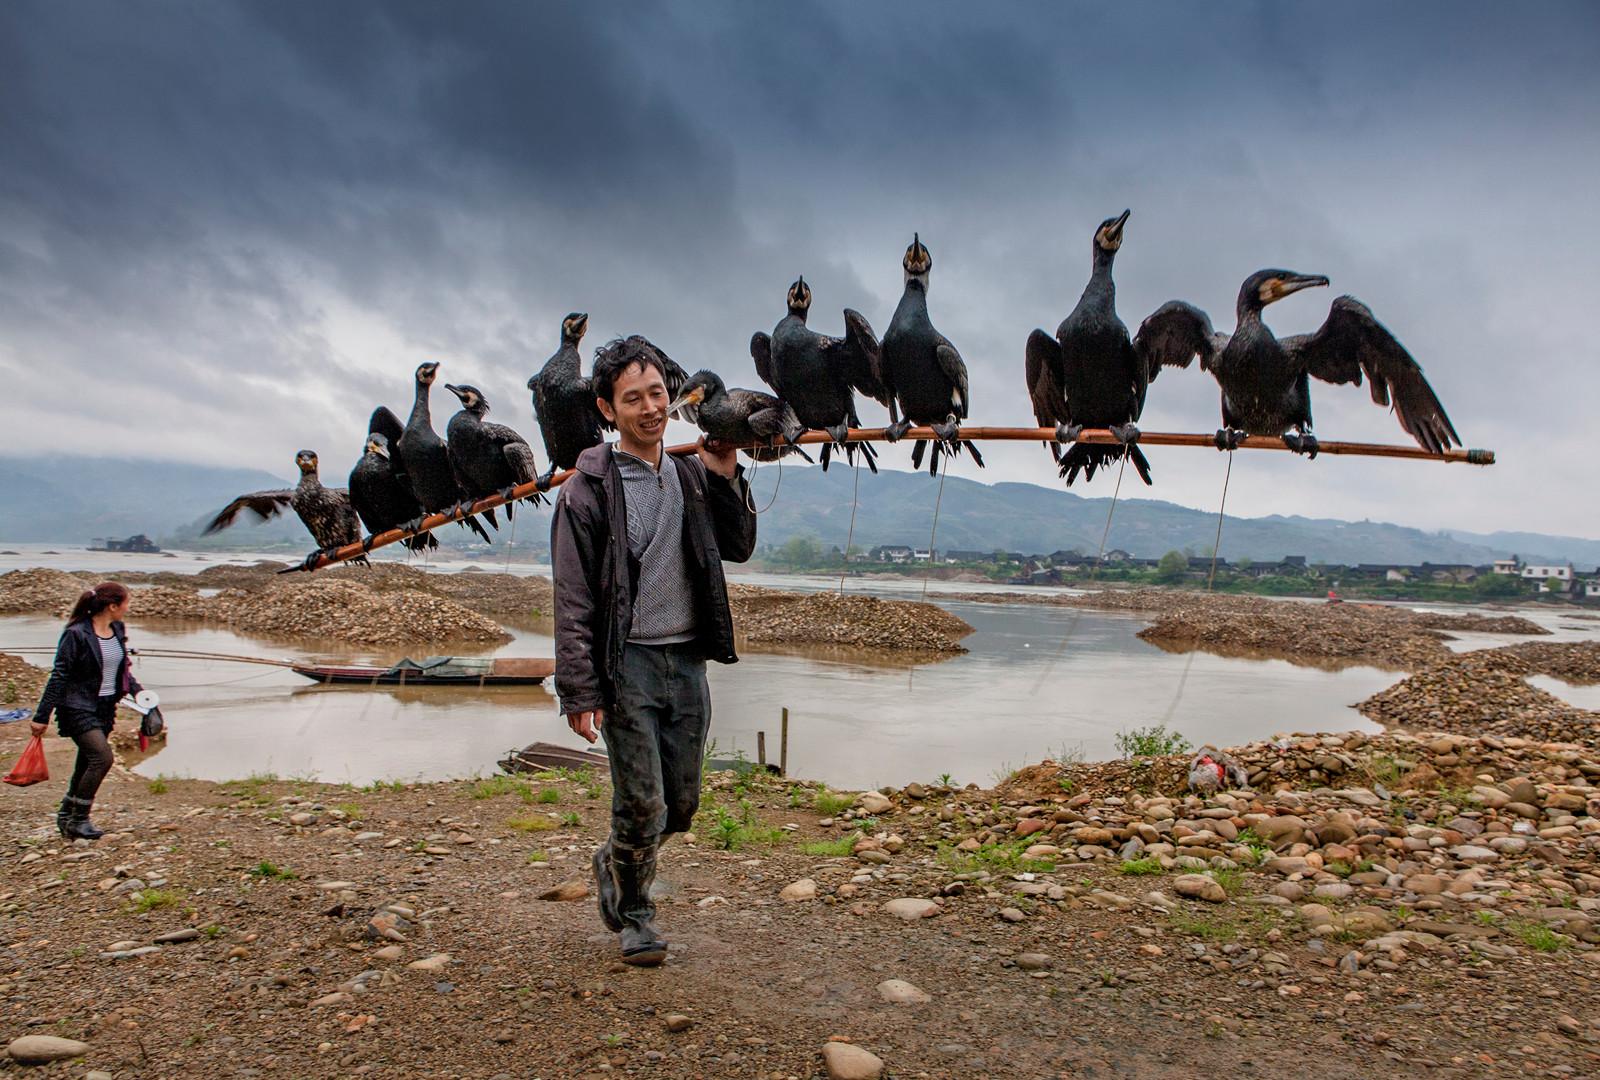 kuang-huimin-lost-dreams-in-tuokou-photography-of-china-5.jpg